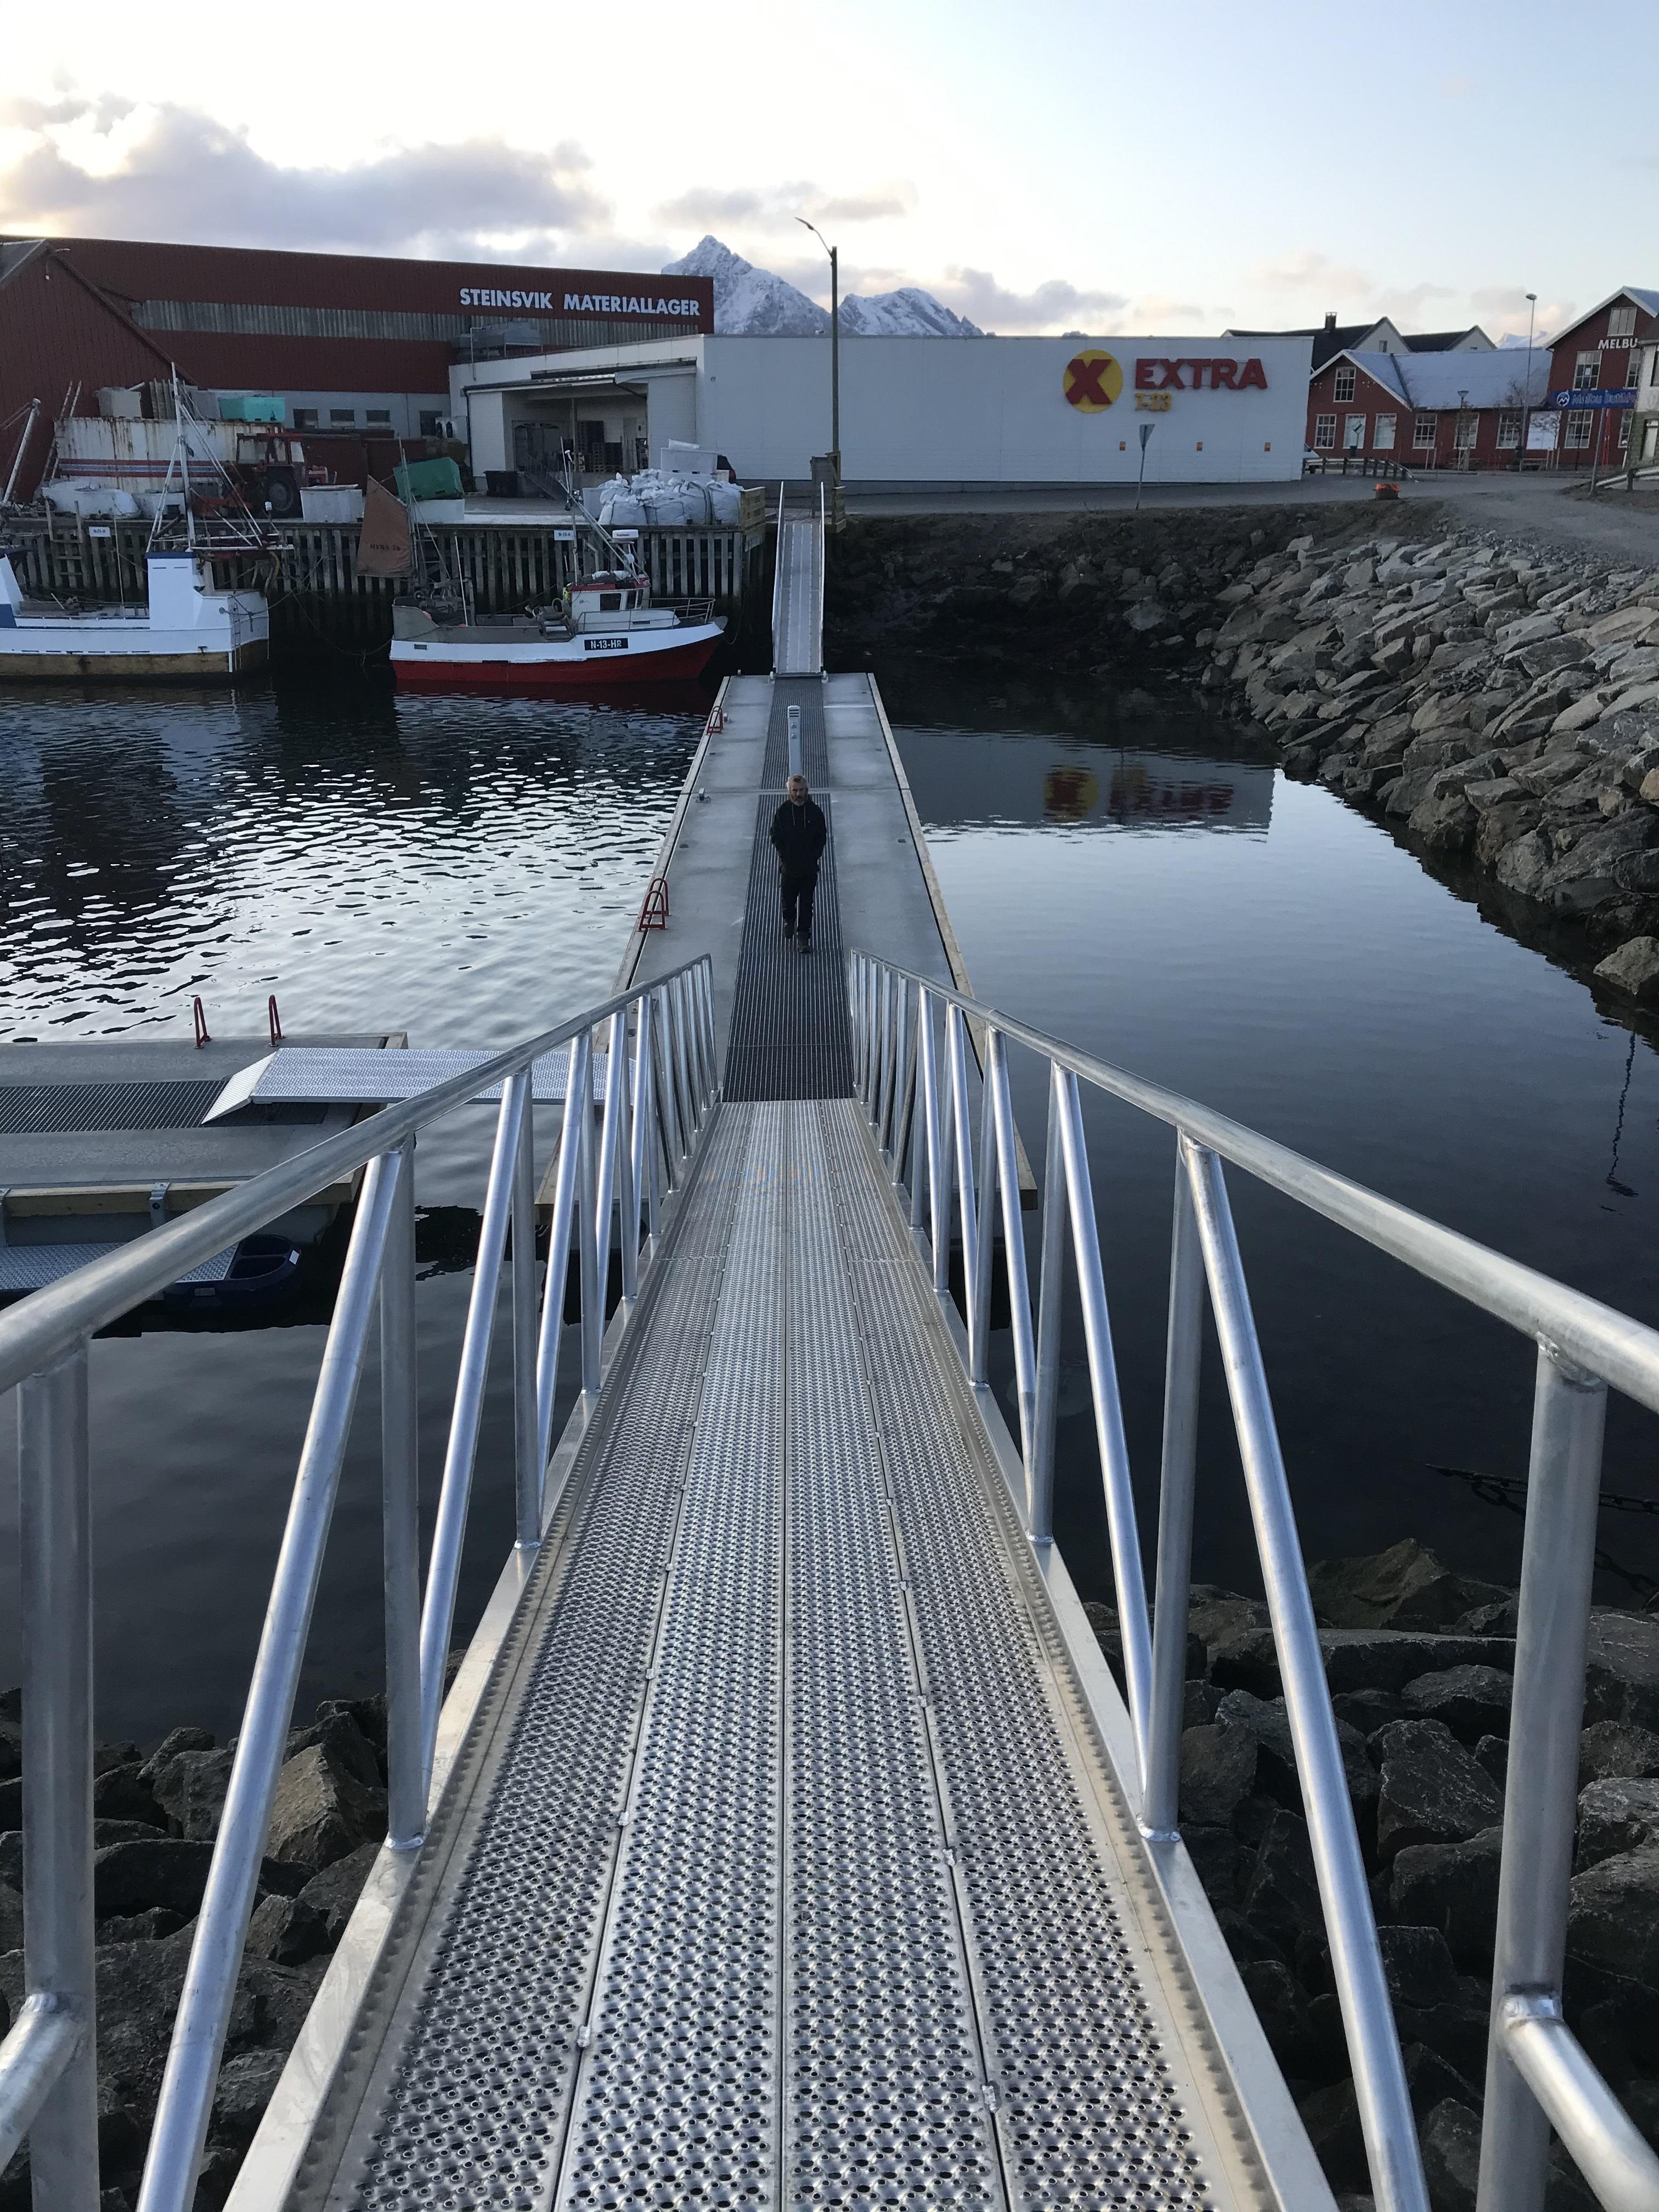 https://www.marinasolutions.no/uploads/Hadsel-havn-melbu-snøfrie-betongbrygger-marina-solutions-Tallykey-strømposter-7.jpg